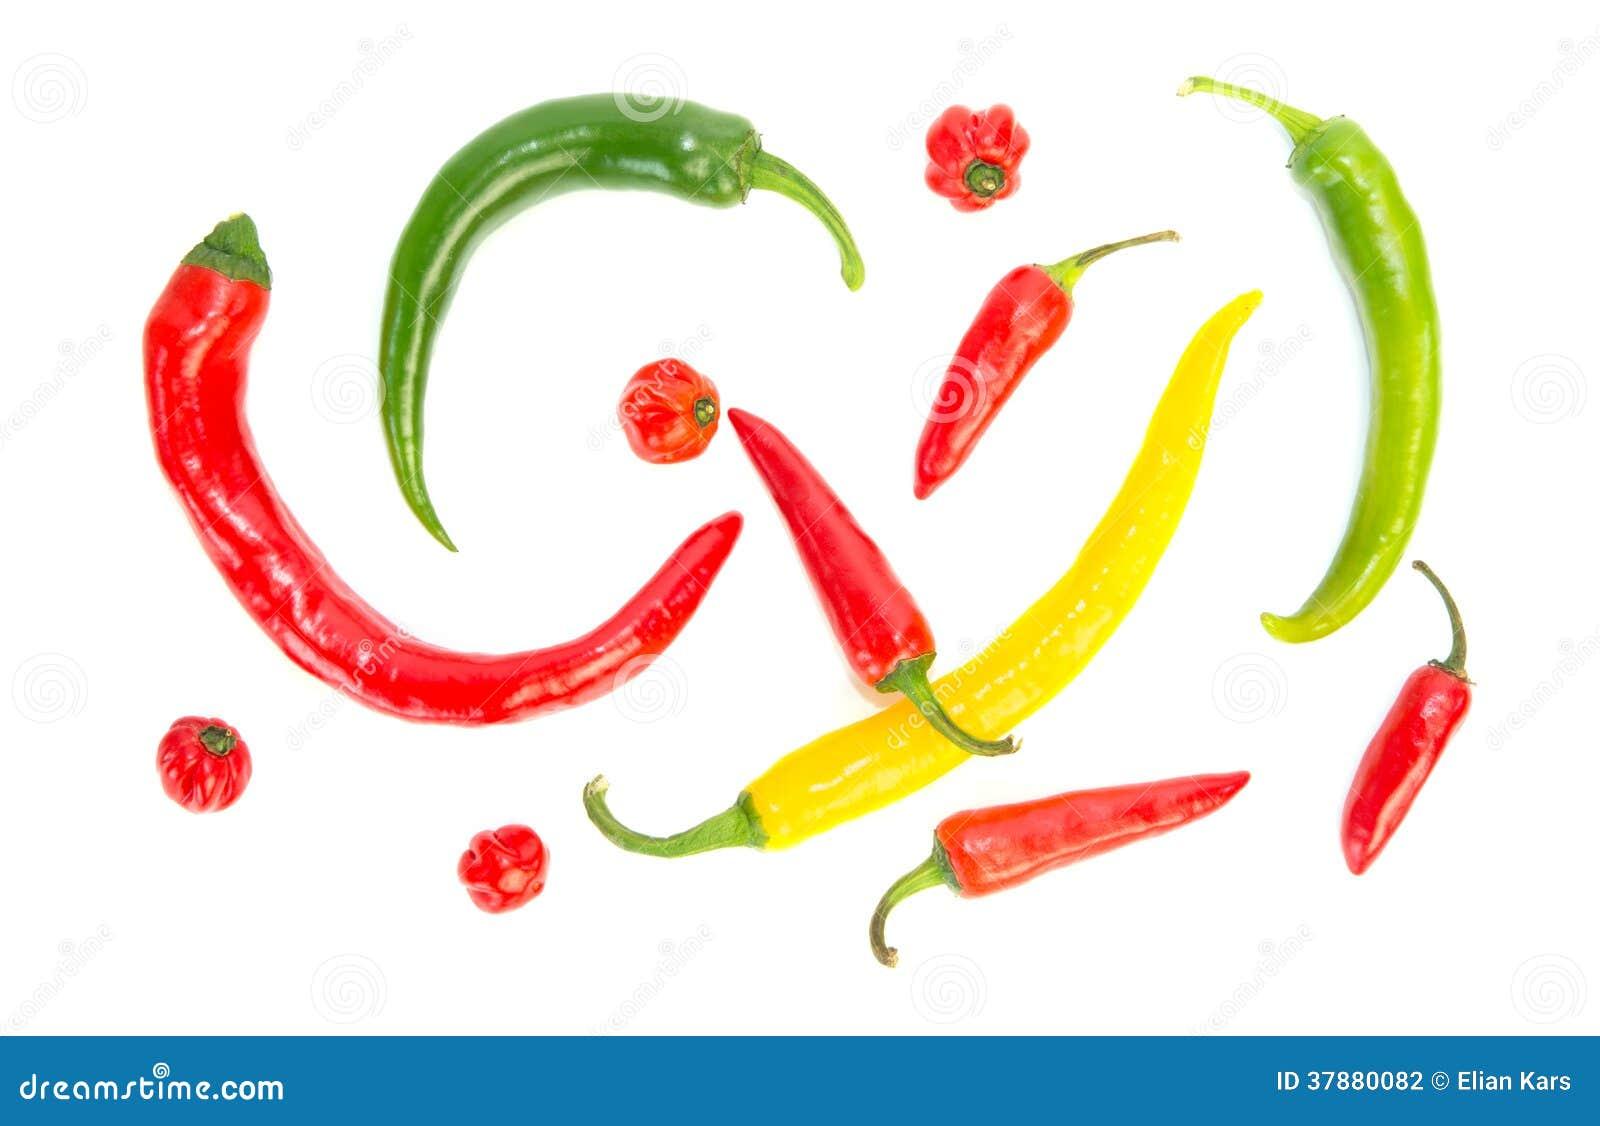 Diverse gekleurde hete peper